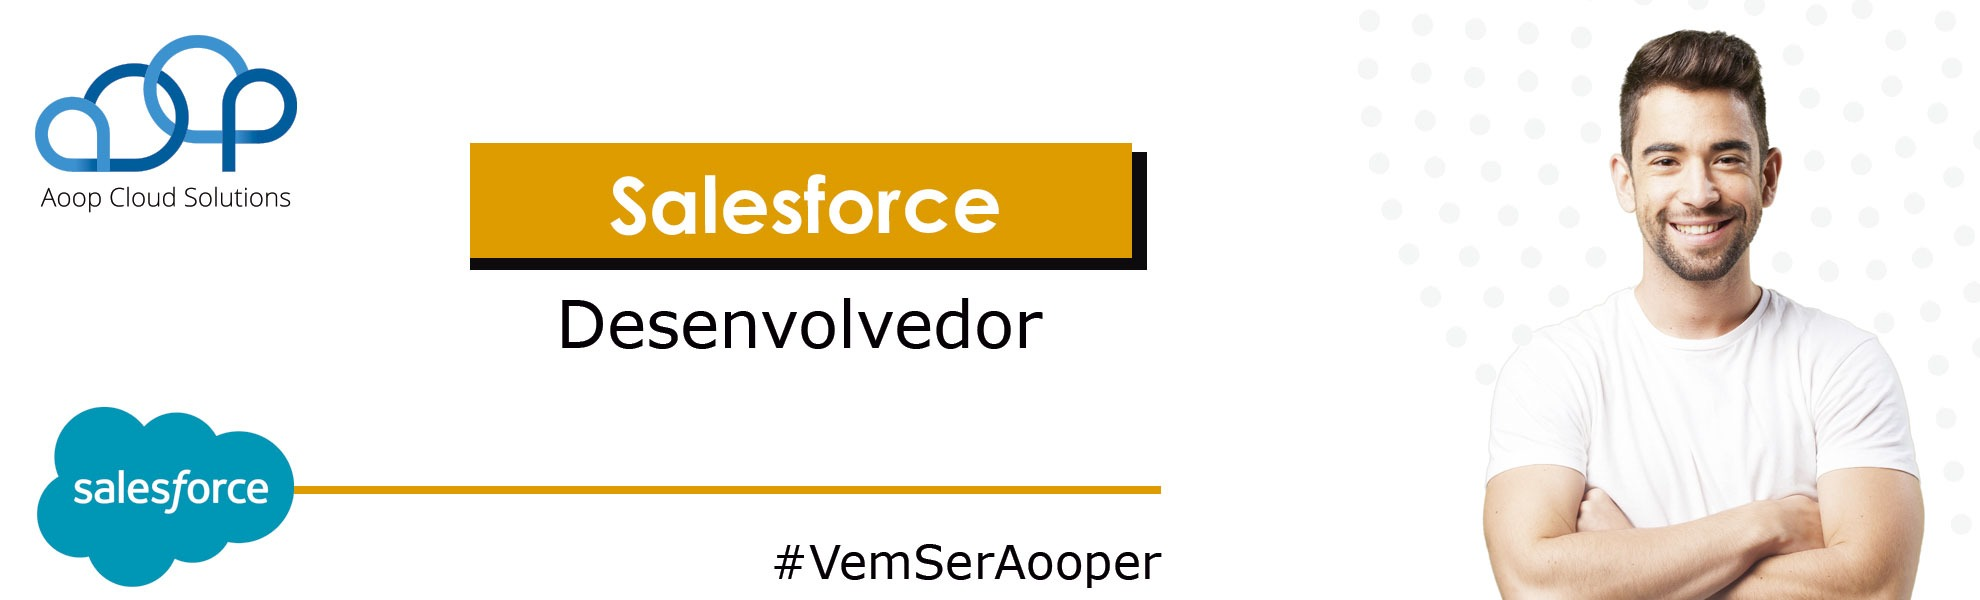 Desenvolvedor - Salesforce 1